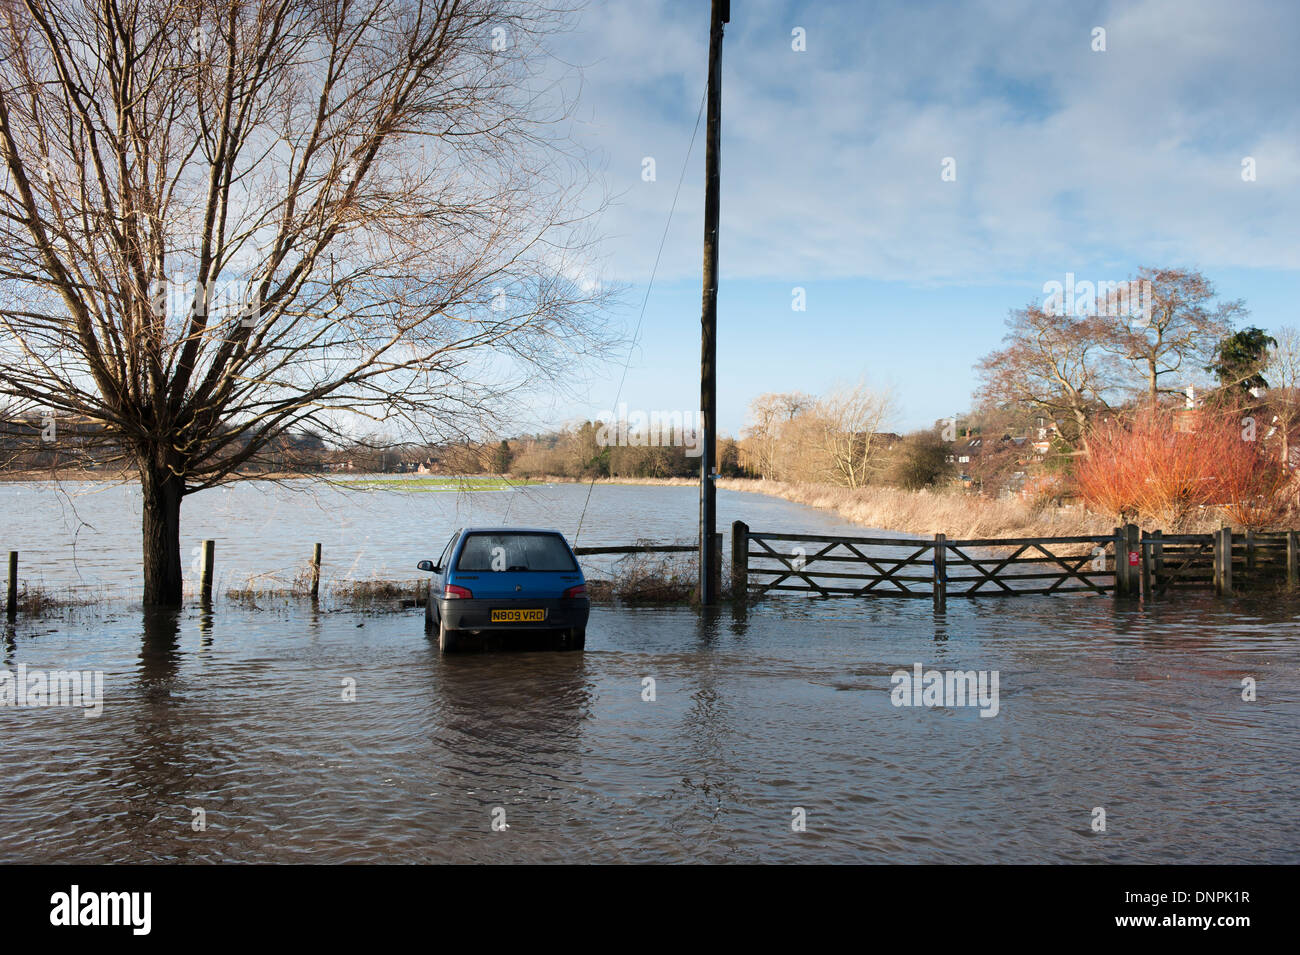 Flooding, River Wey, Godalming, Surrey - Stock Image